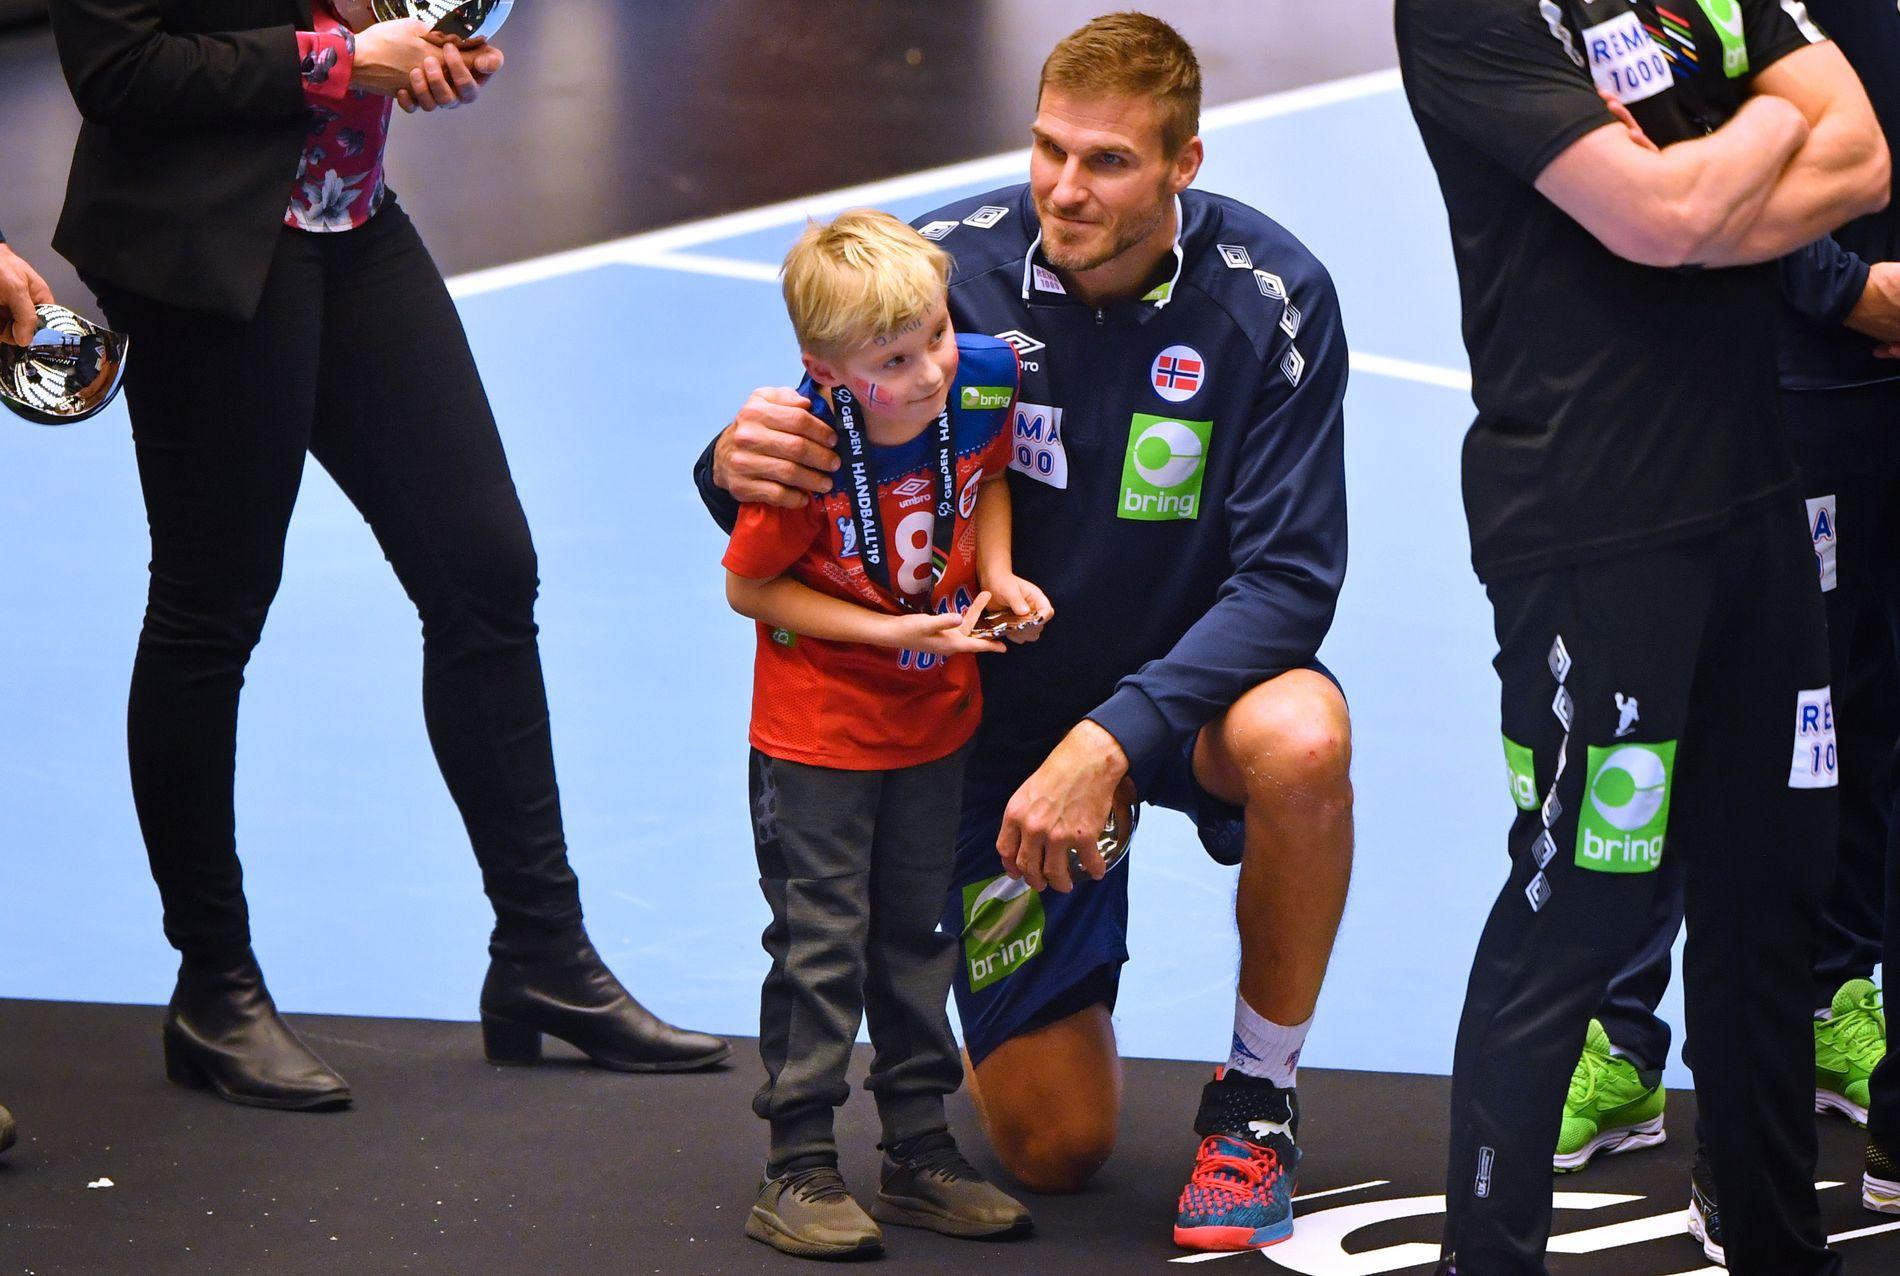 FAMILIEKJÆR: Bjarte Myrhol sammen med sønnen Rasmus etter VM-finalen i januar.